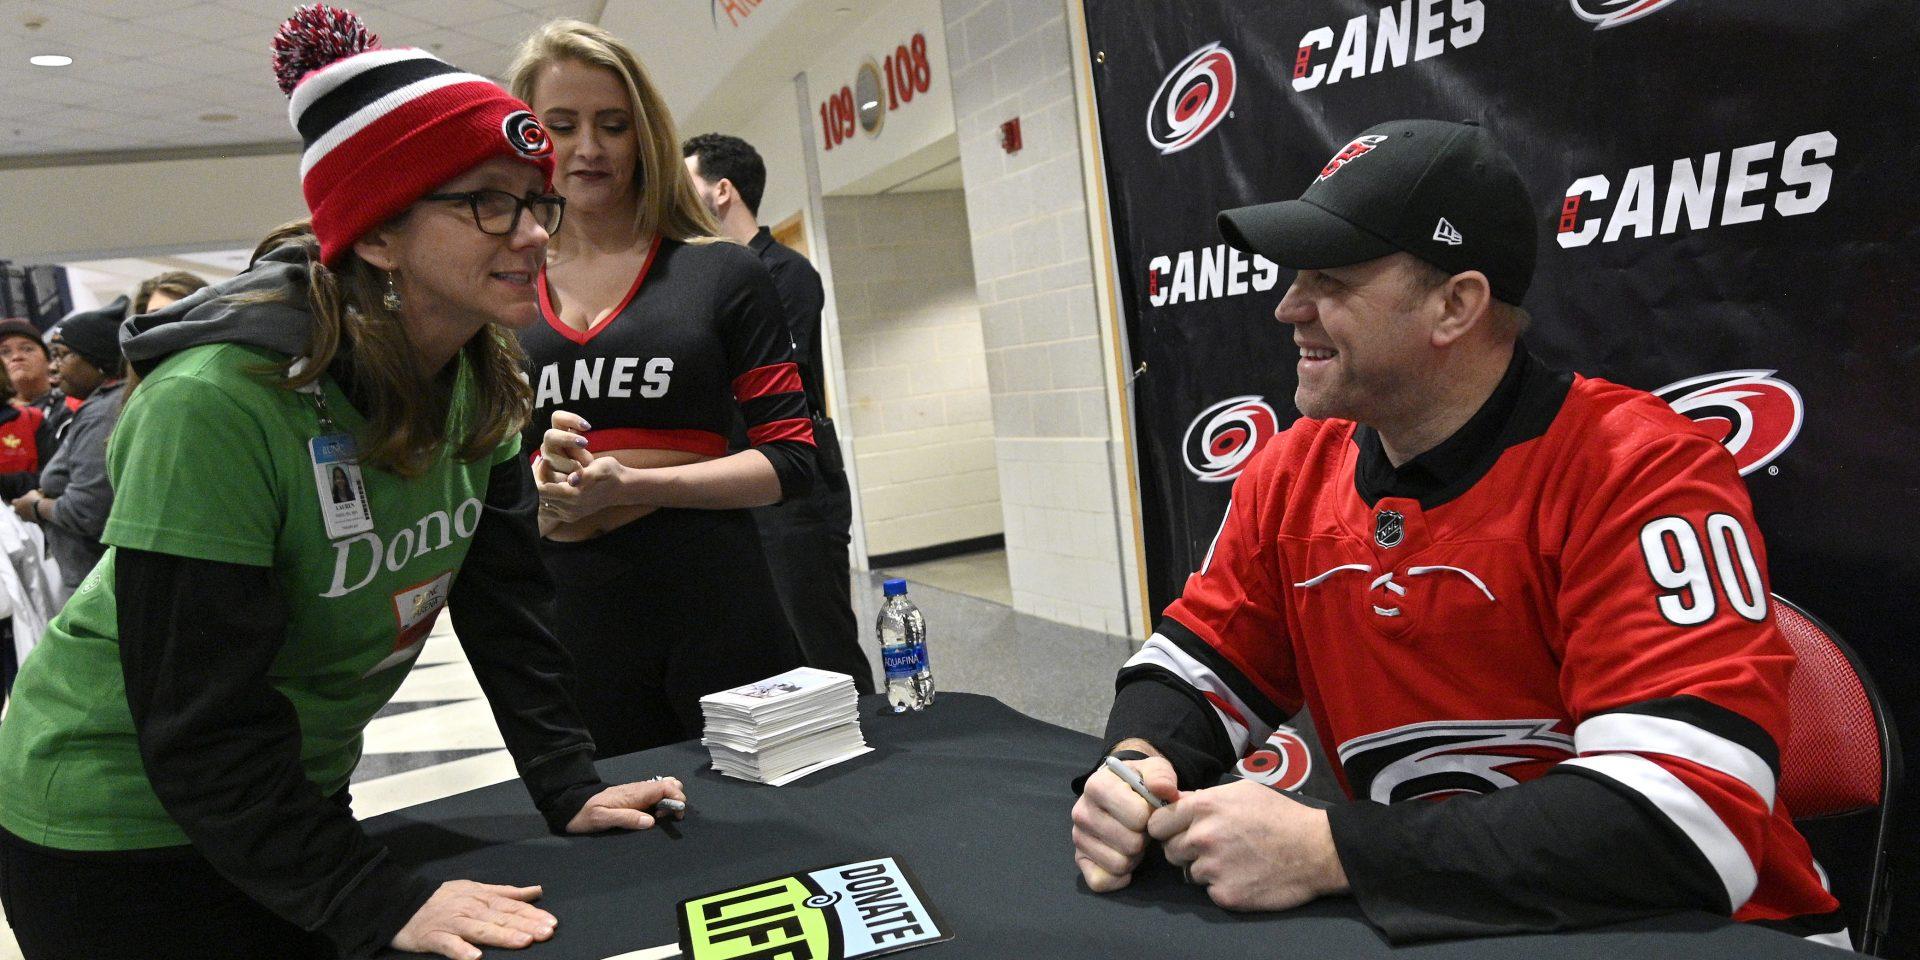 Overnight NHL Star Still Has Time for Shop Talk